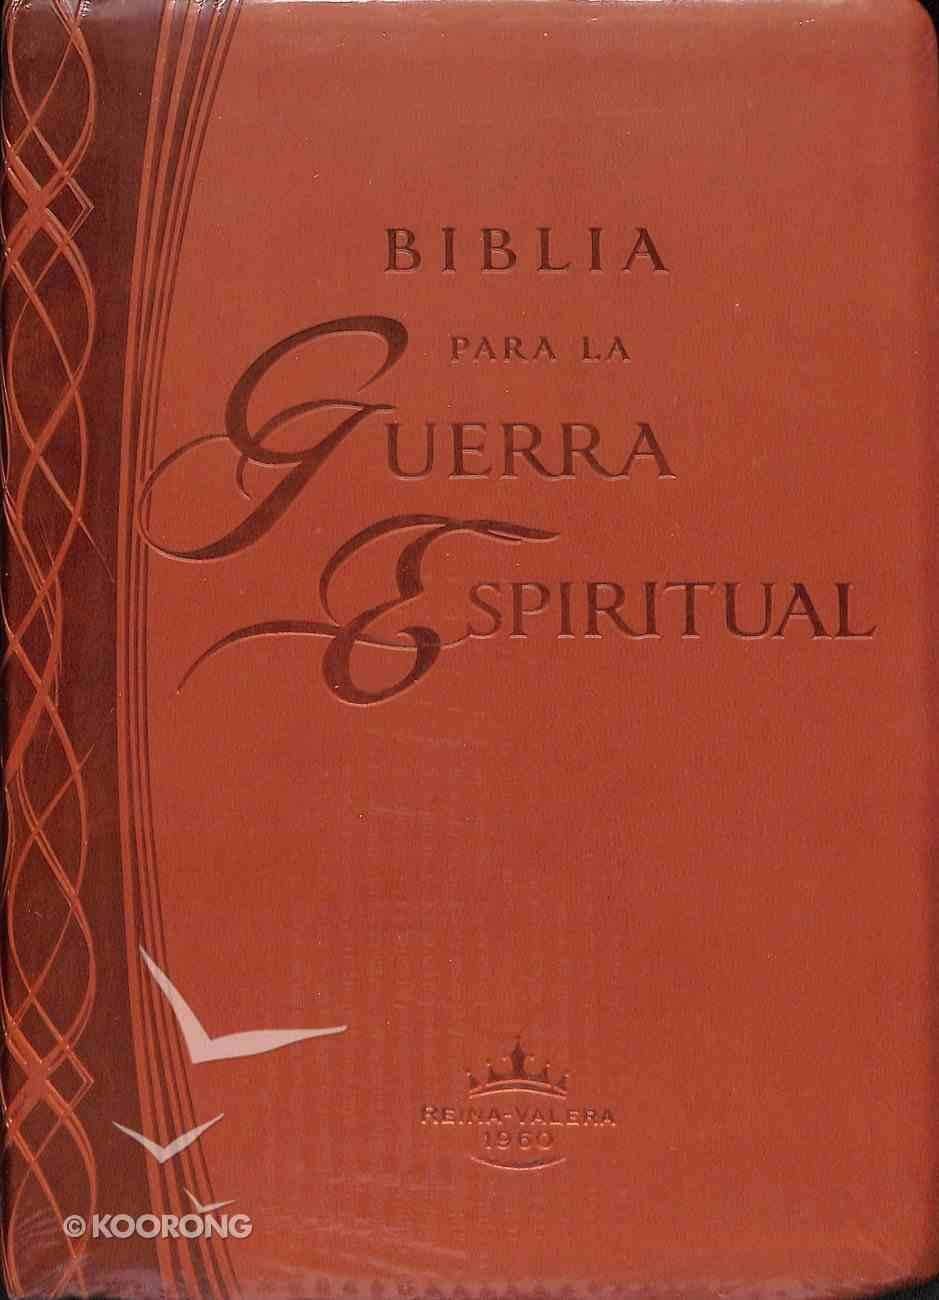 Rvr1960 Biblia Para La Guerra Espiritual (Spiritual Warfare Bible) Imitation Leather